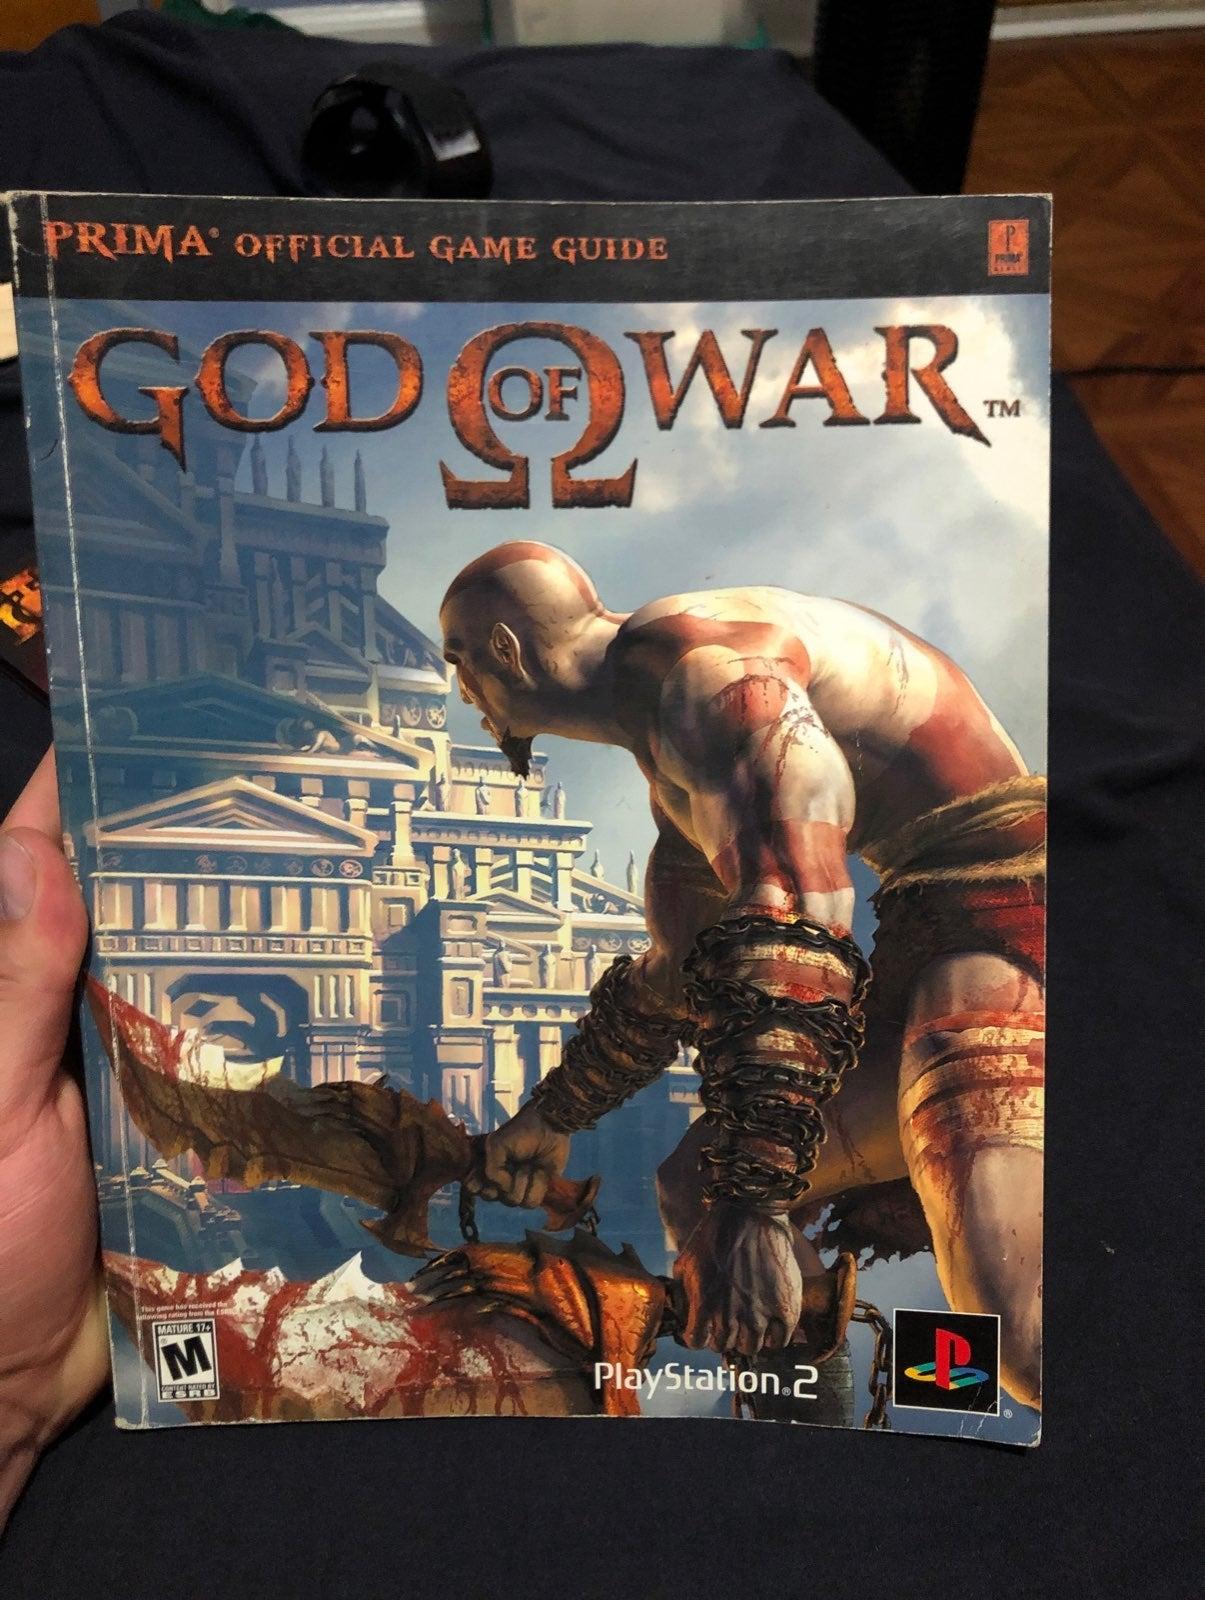 God of War 1 Official Game Guide